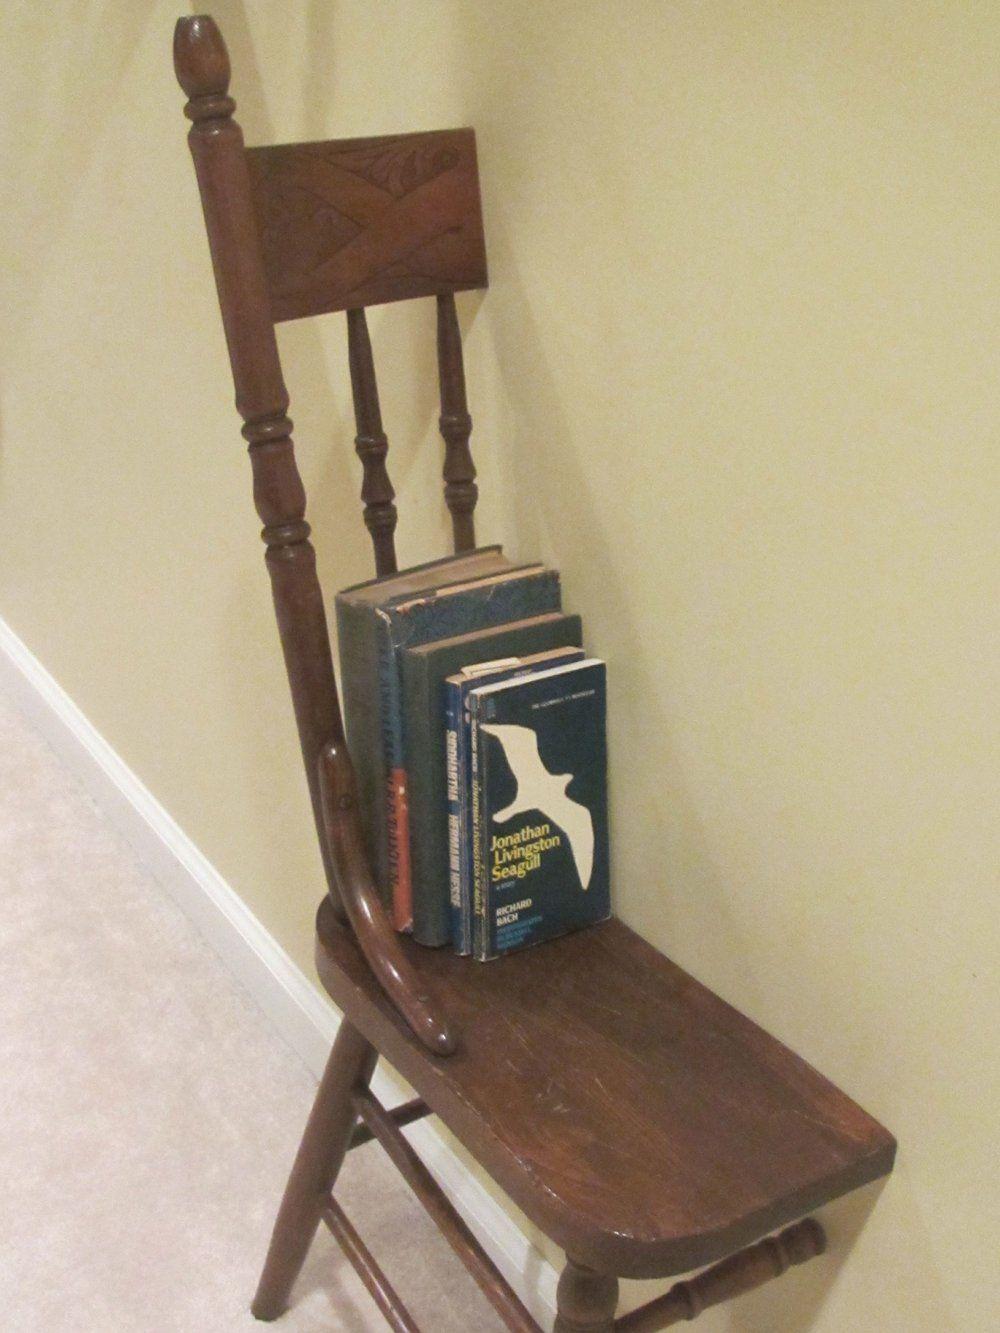 Spindle Back Half Chair Art/Shelf - Make an artistic statement ...